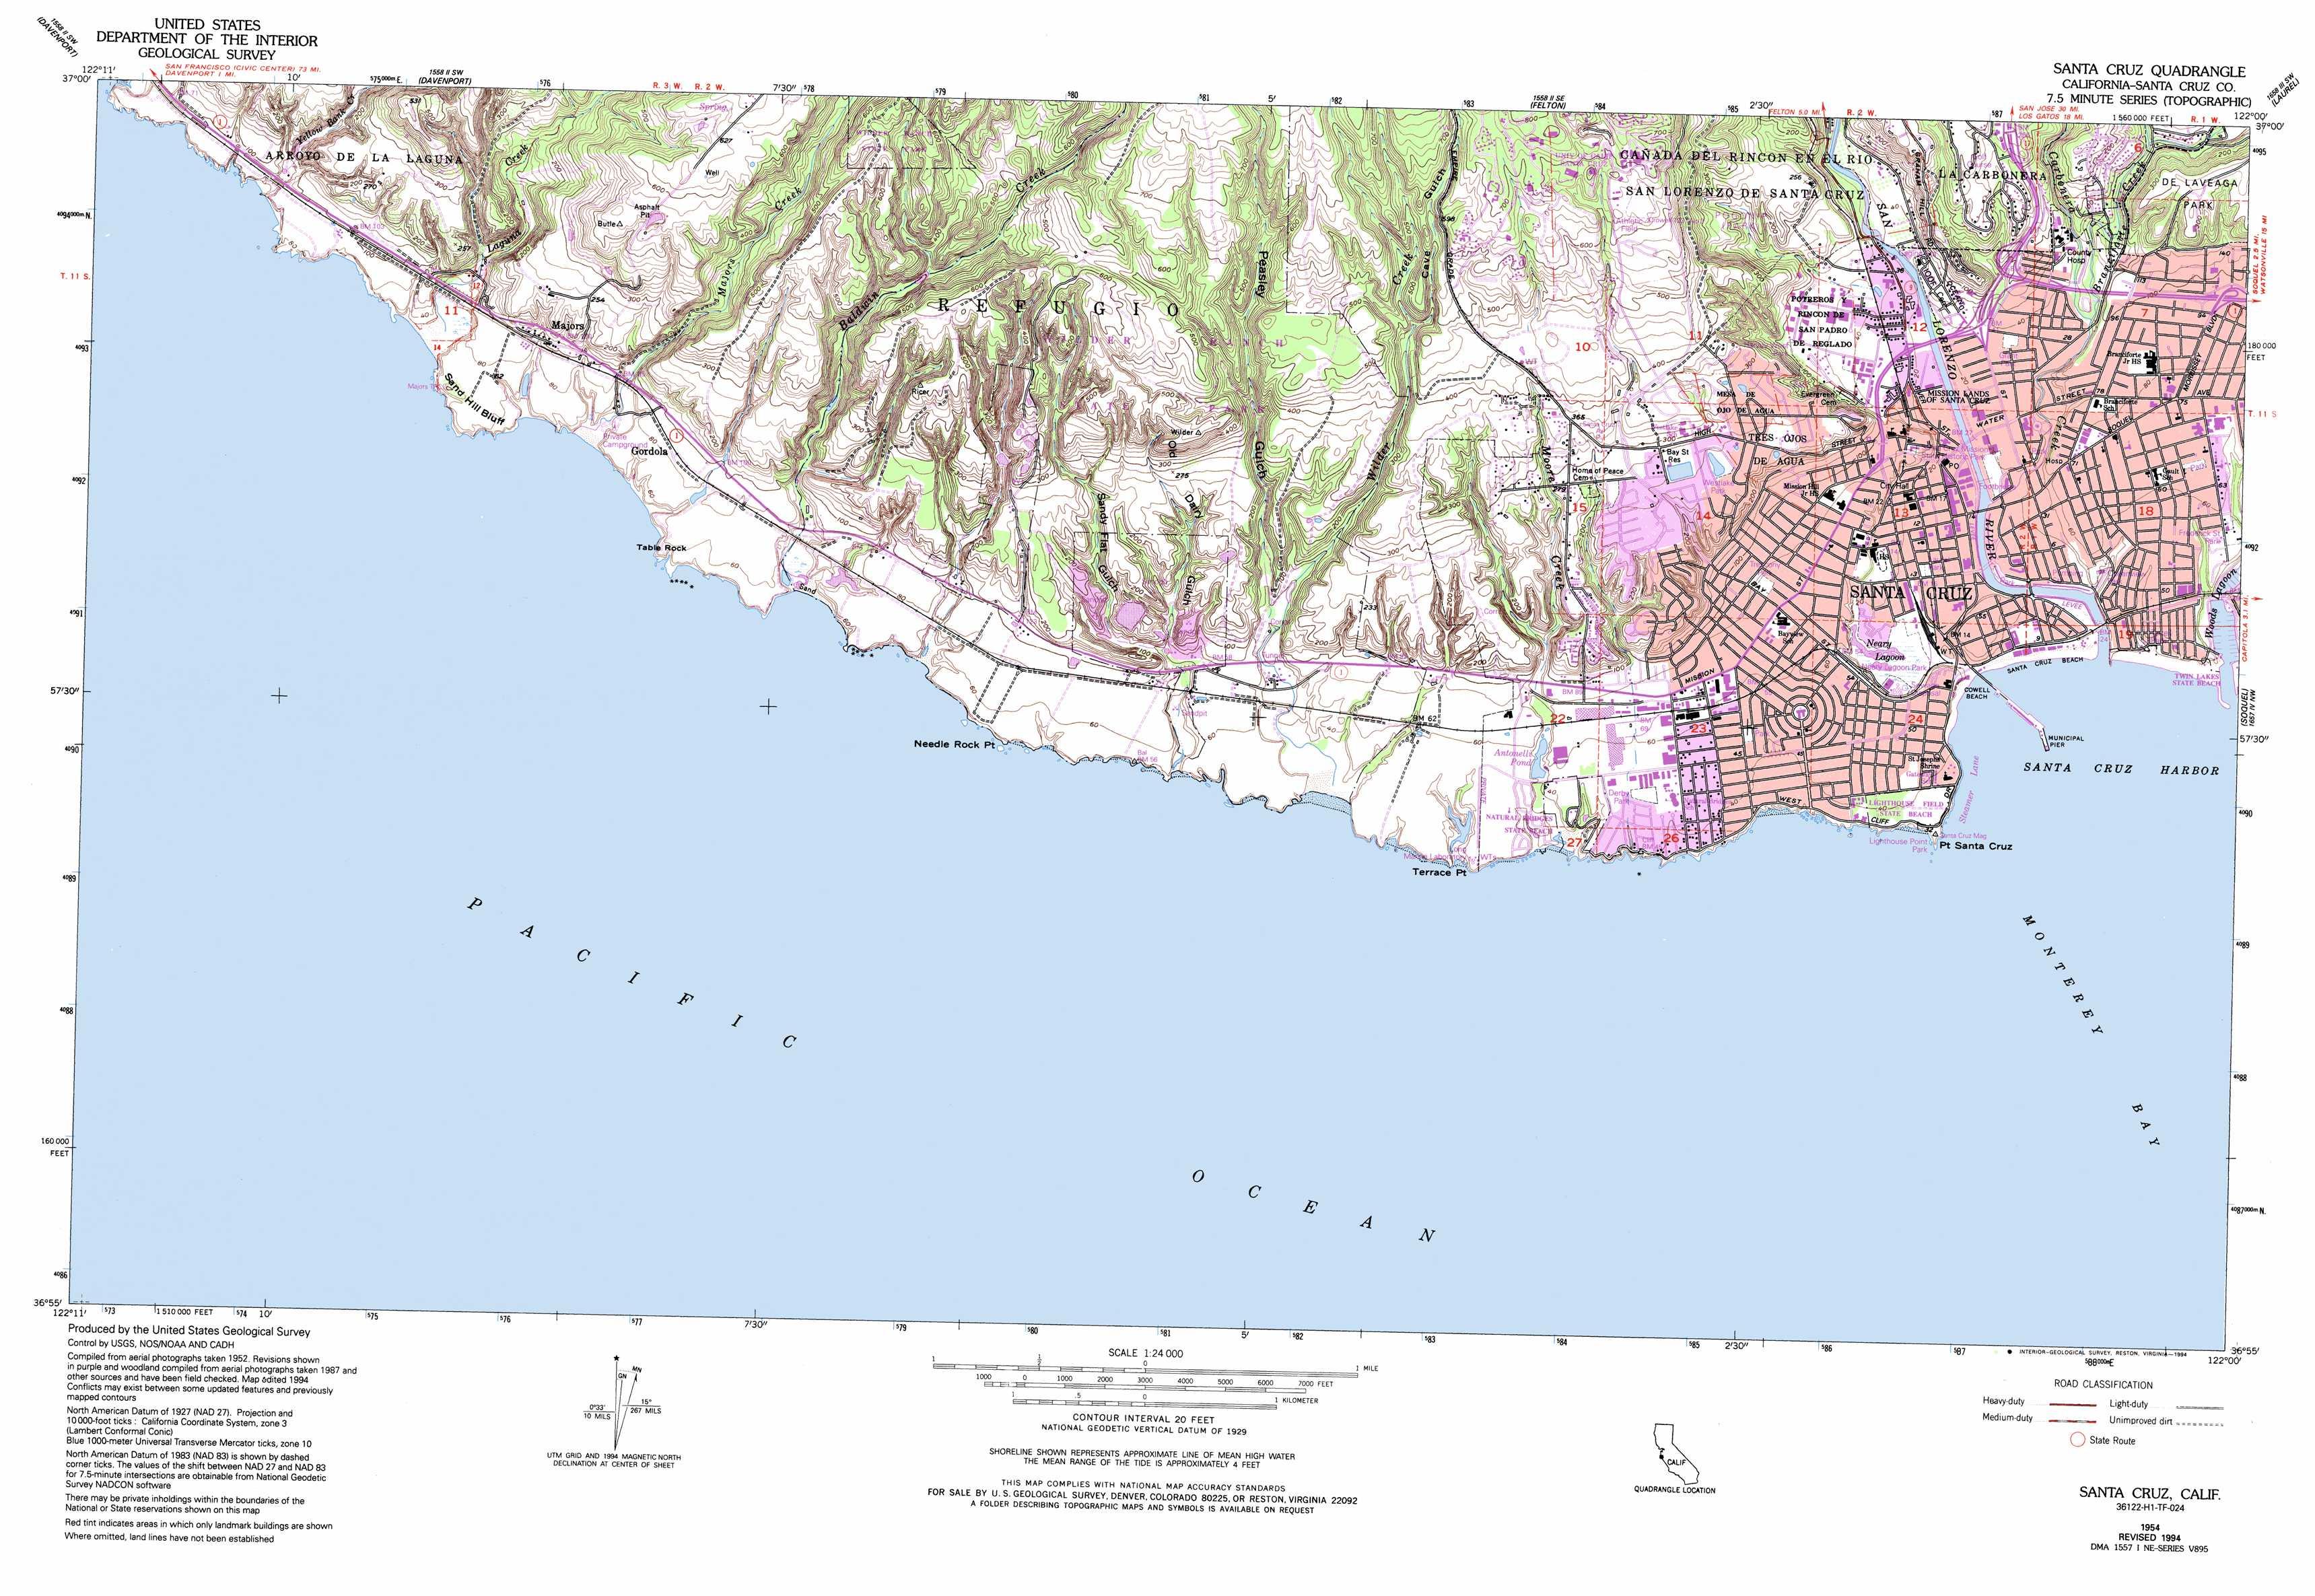 Pacific Coast Route Through Santa Cruz California ROAD TRIP USA - Los angeles va map